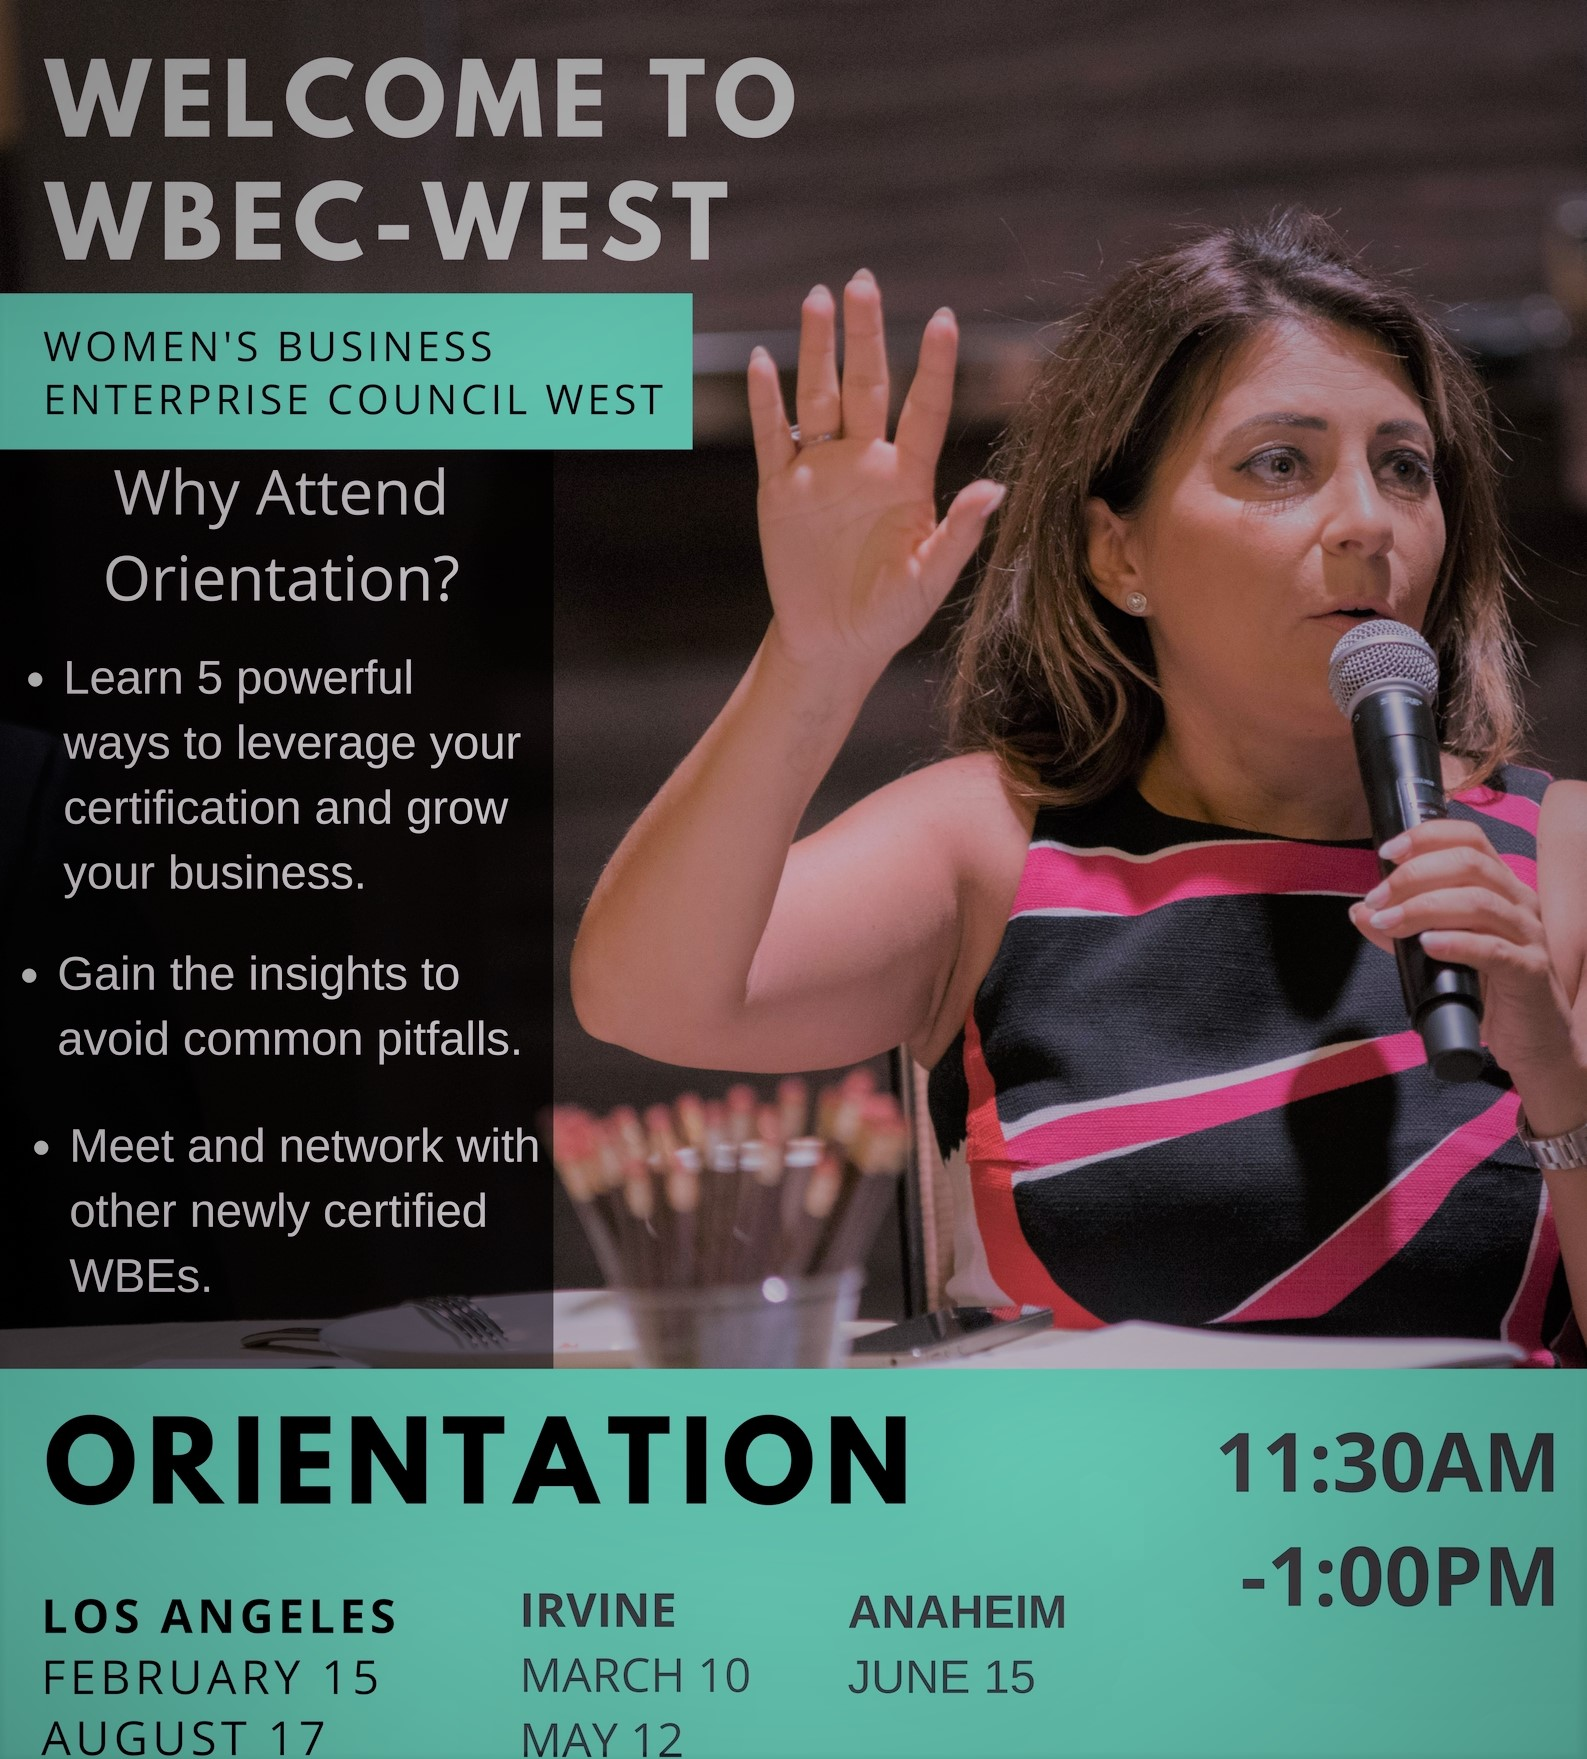 Anaheim - New Certification Orientation Class